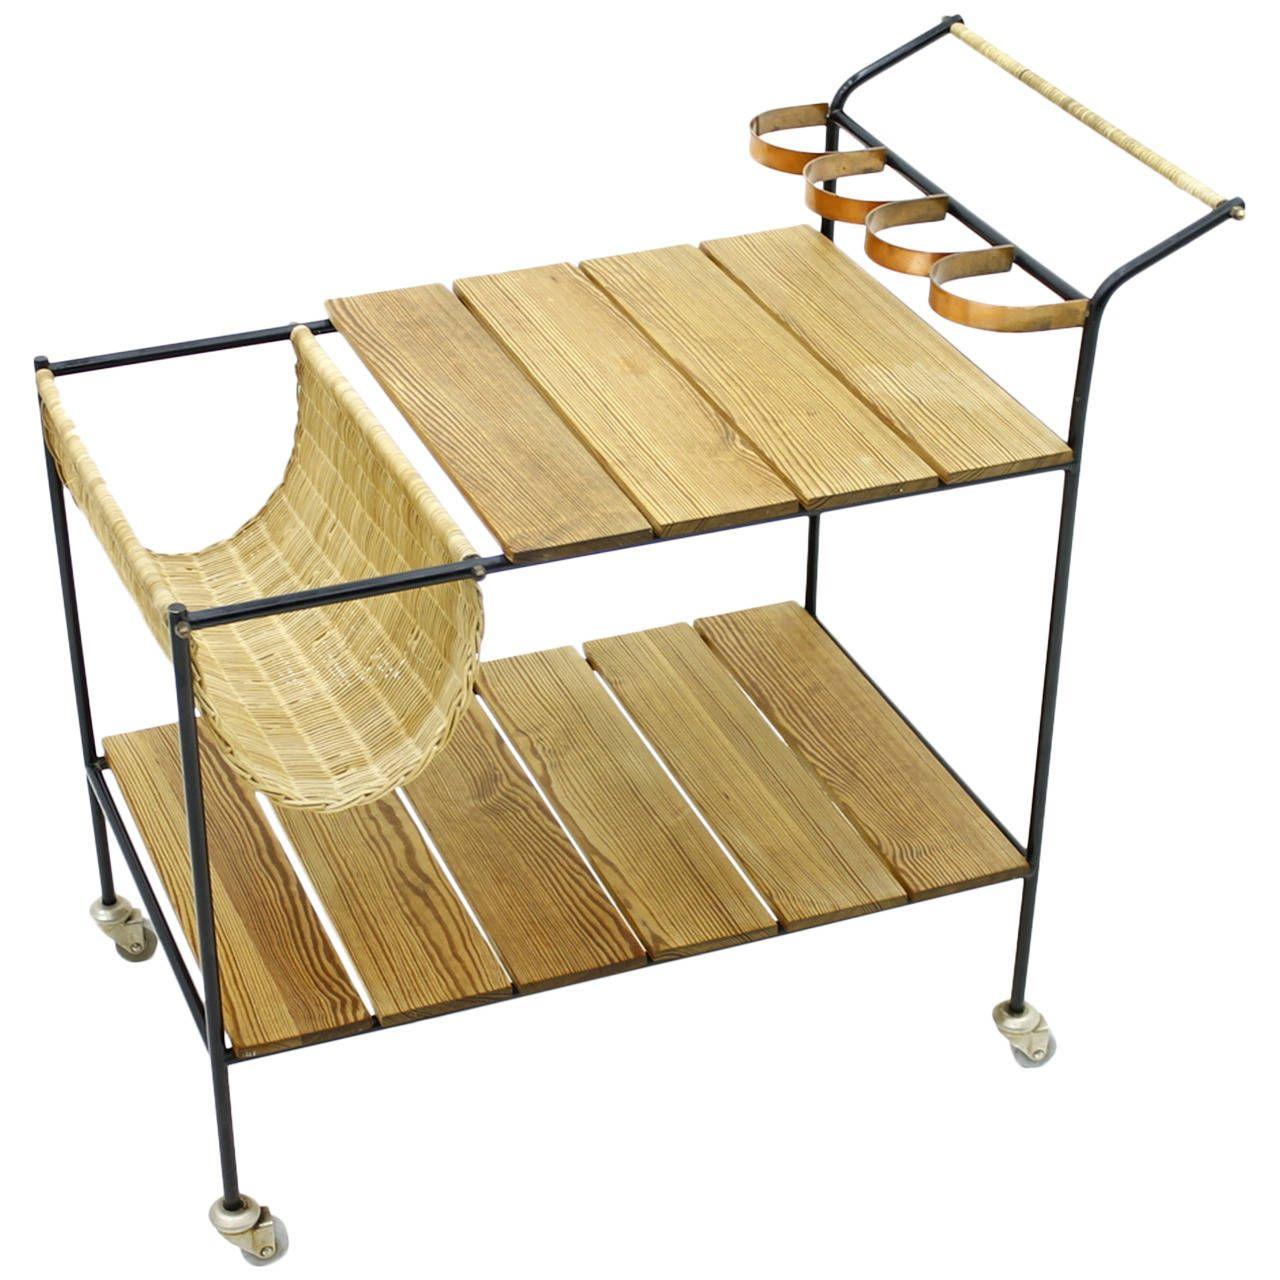 Minimalist Bar Cart In Style Of Arthur Umanoff, Circa 1960s